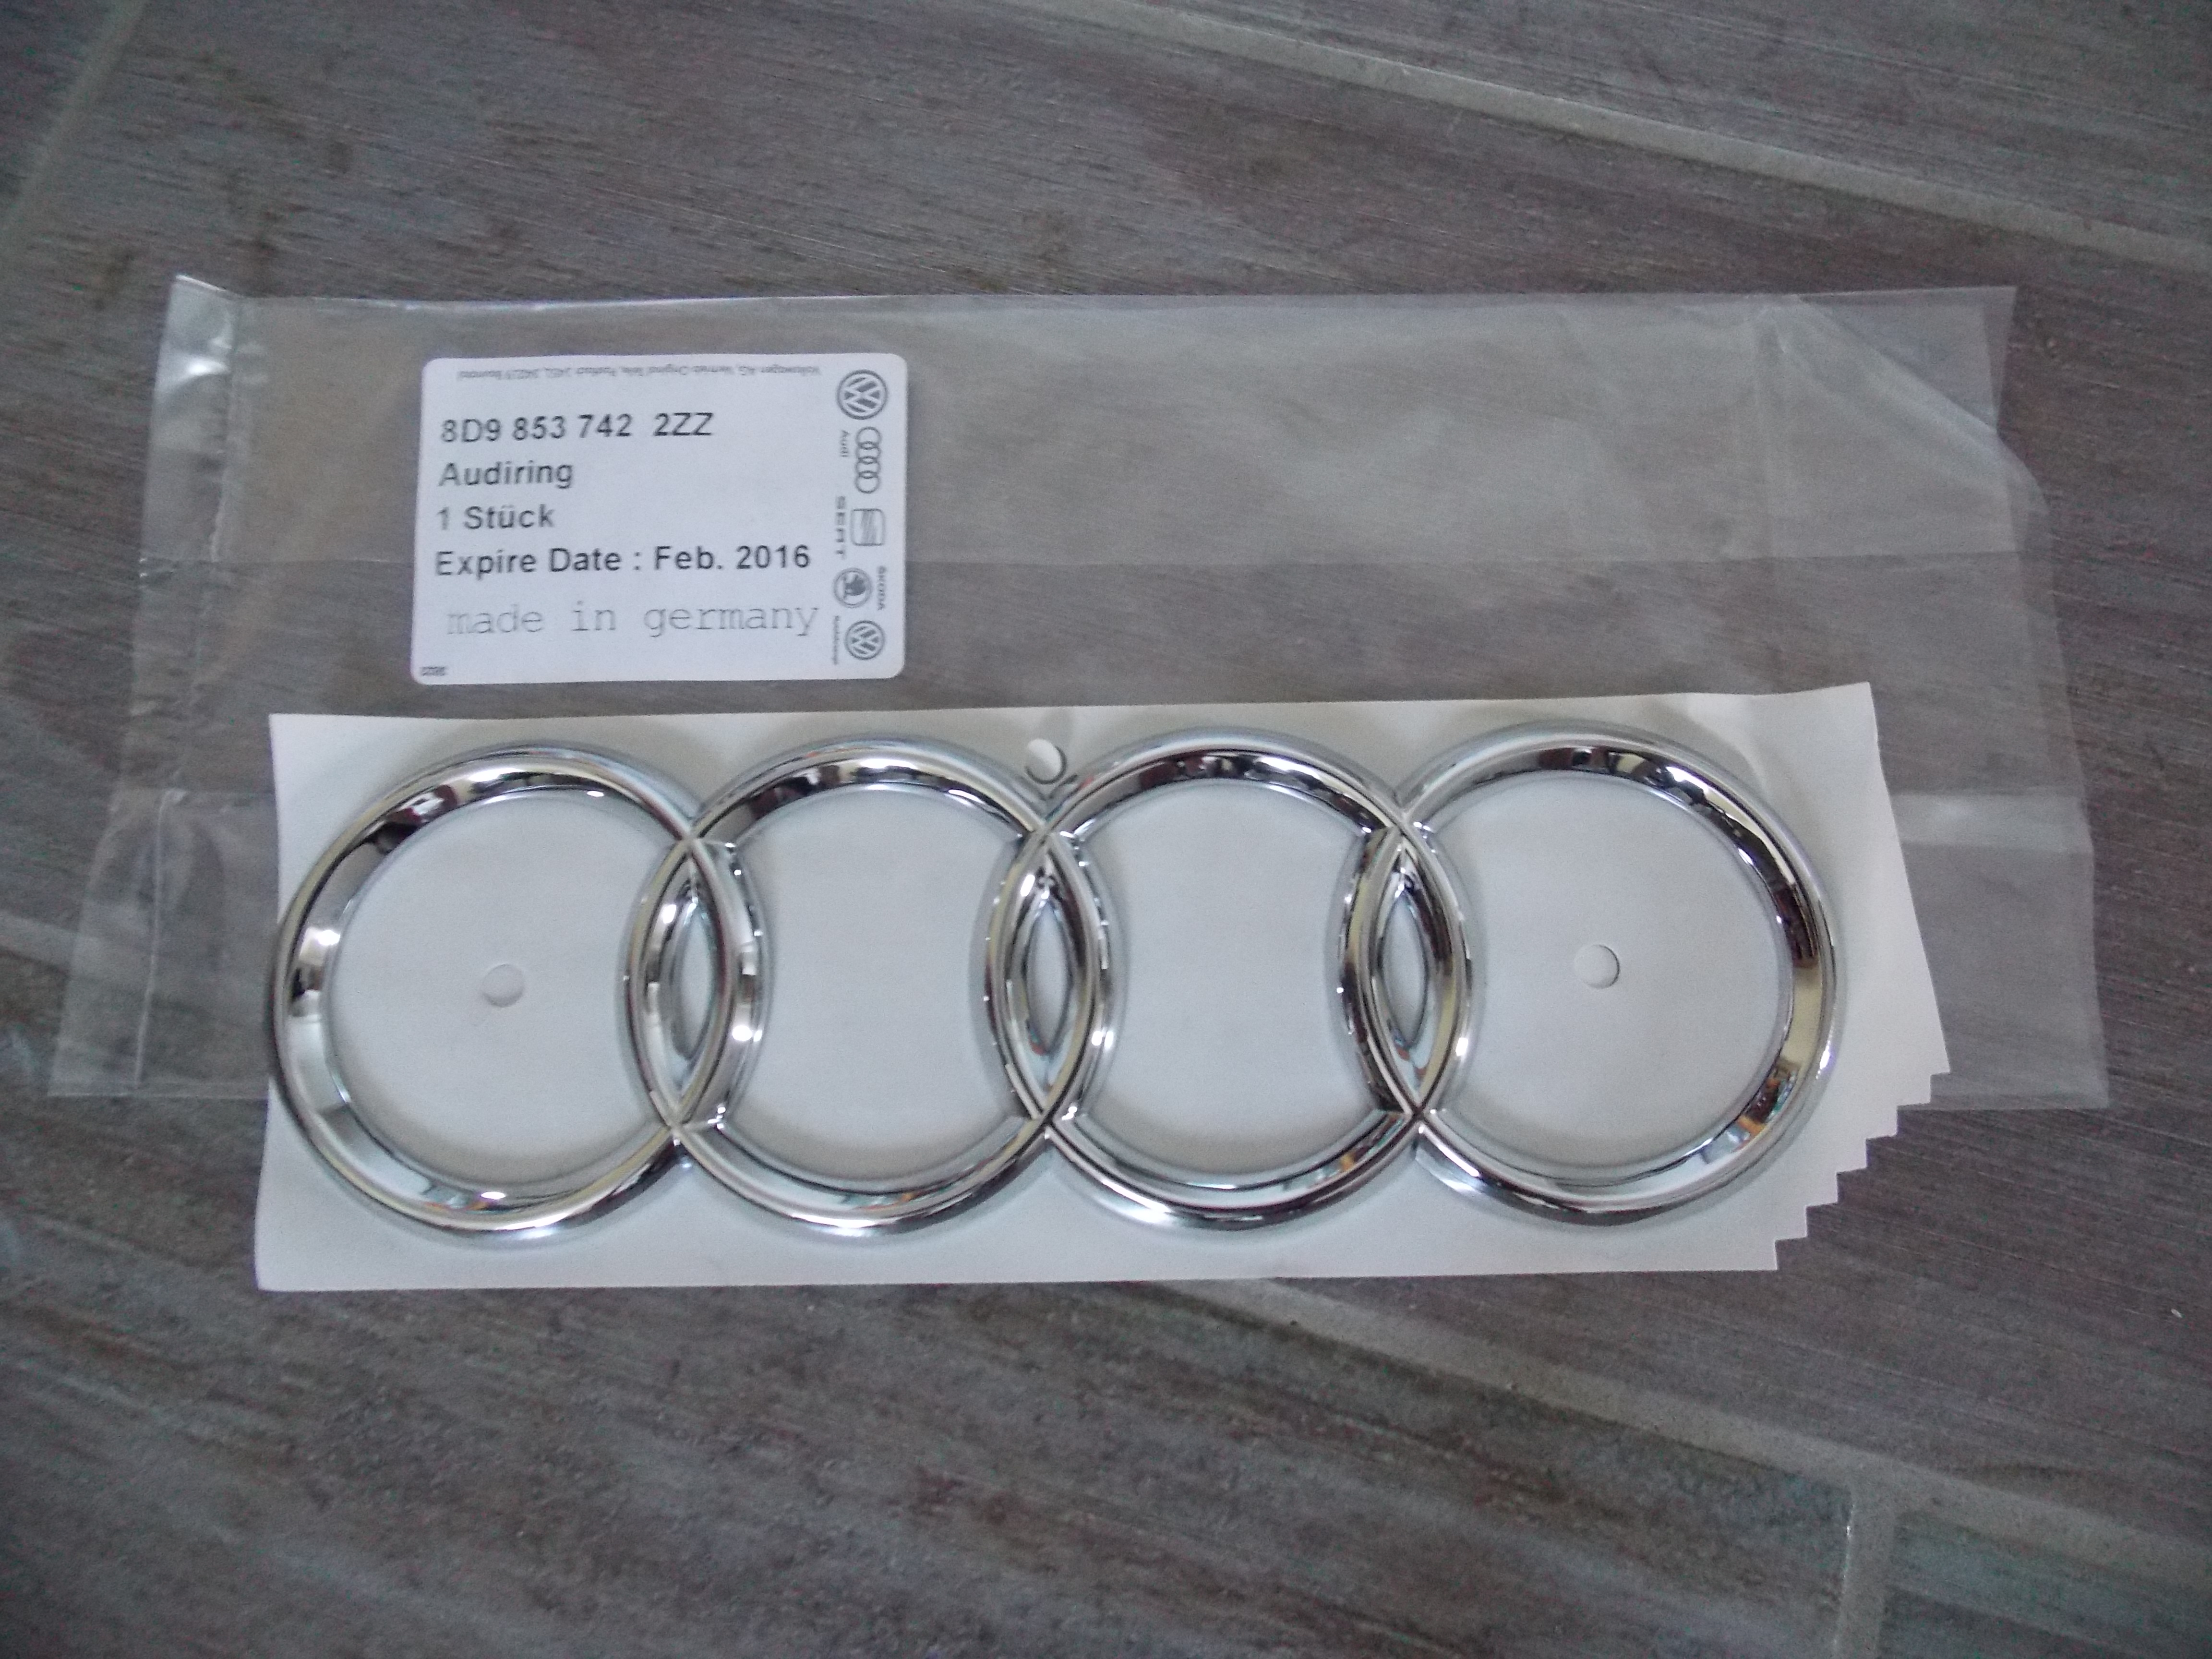 Audi Ringe Schwarz Grill Emblem A1 A3 A4 A5 A6 A8 S6 Rs5 S5 Rs4 S4 S3 ...